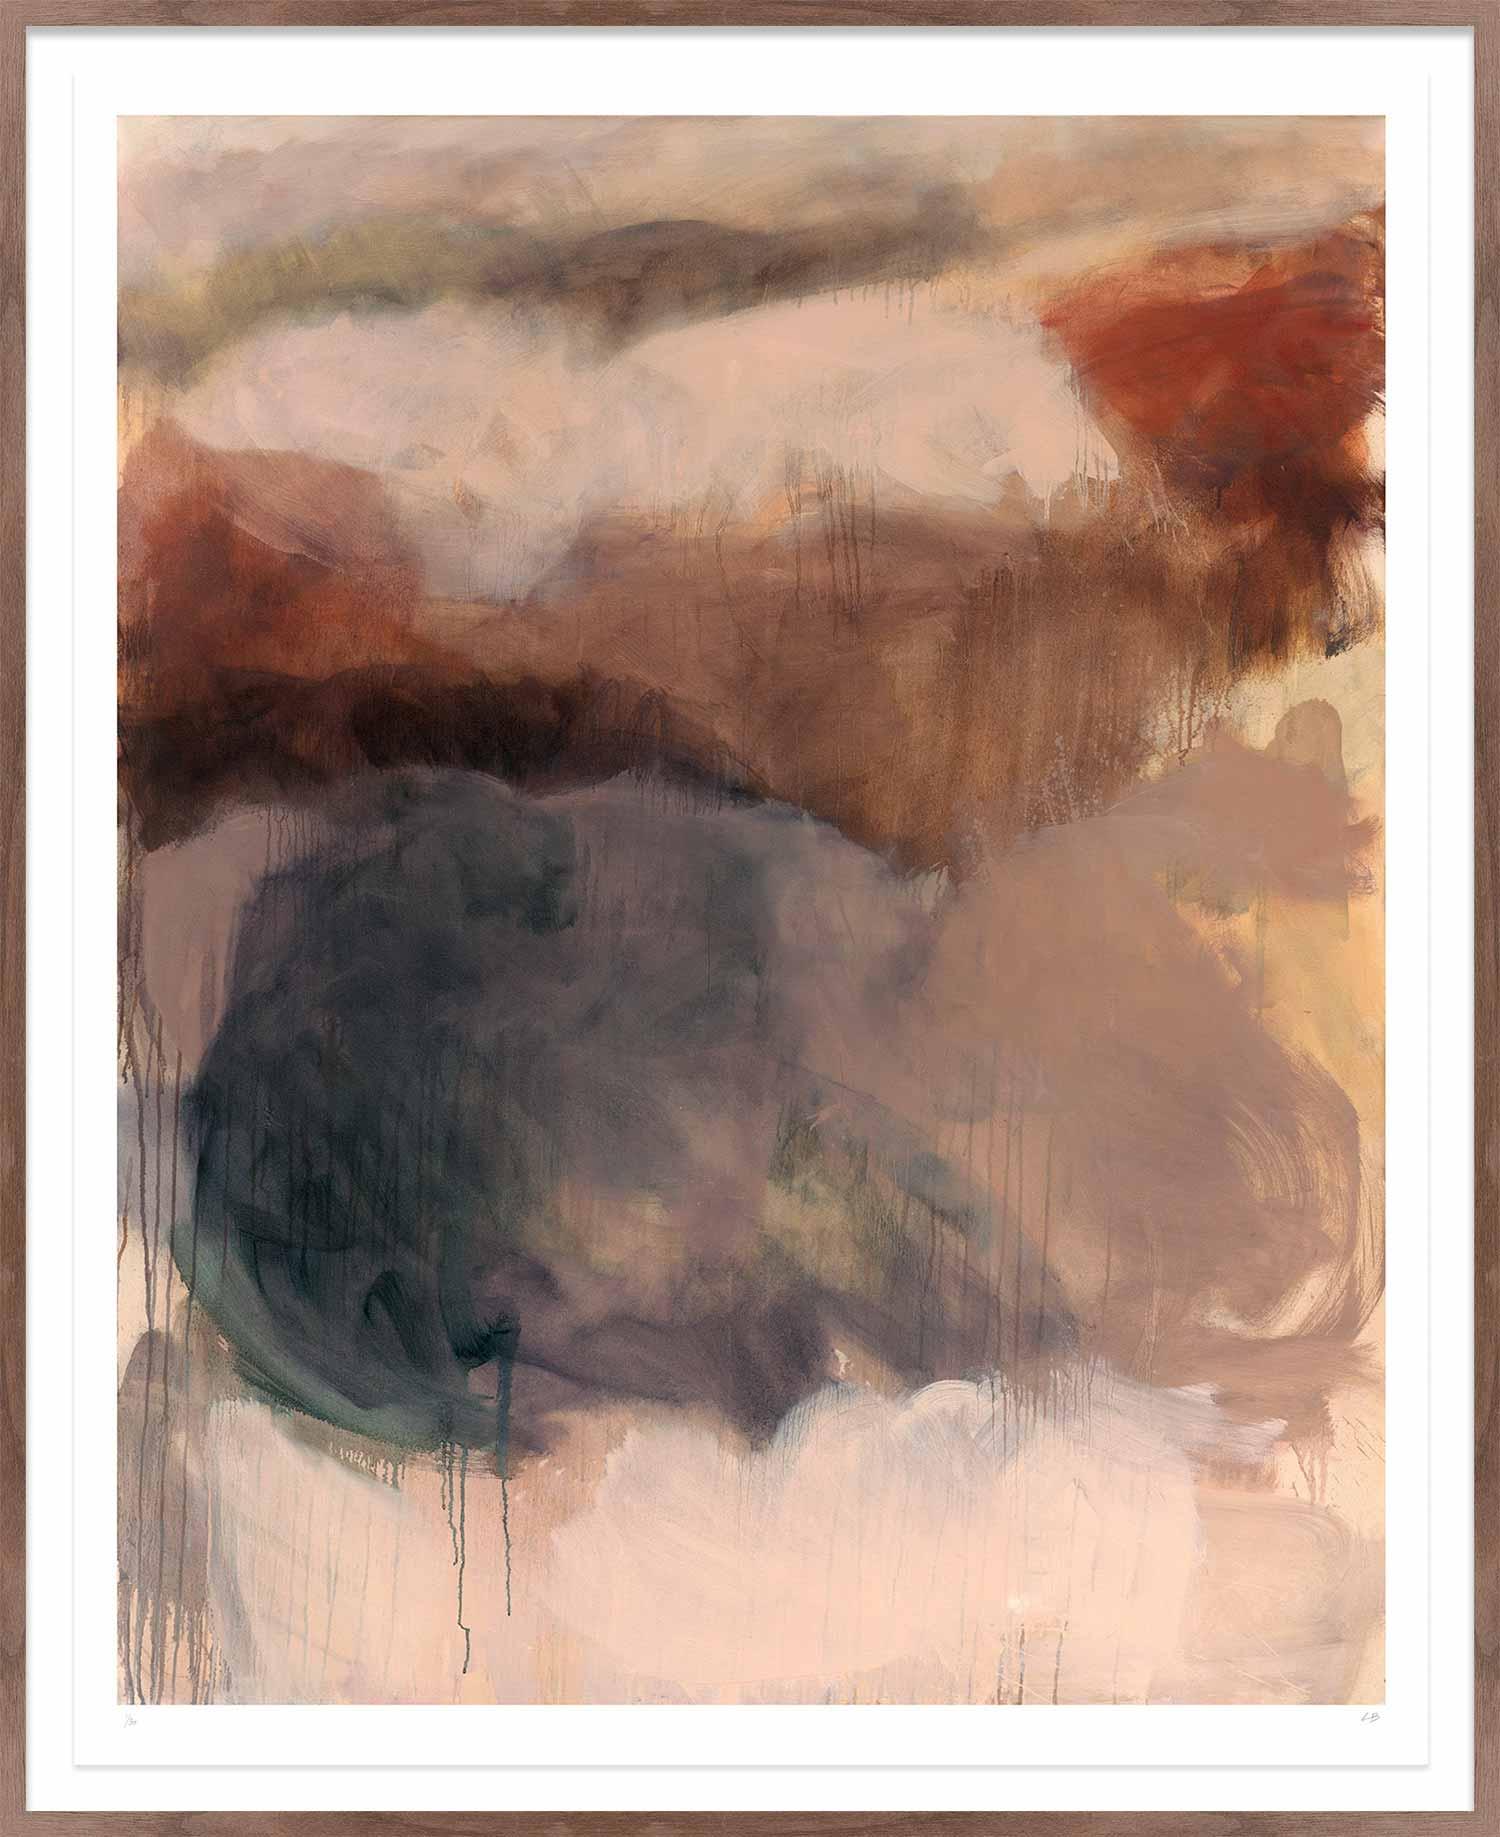 Hang Tough 'Rosy Retrospection' Float Framed in Hardwood Walnut (Framing Only)